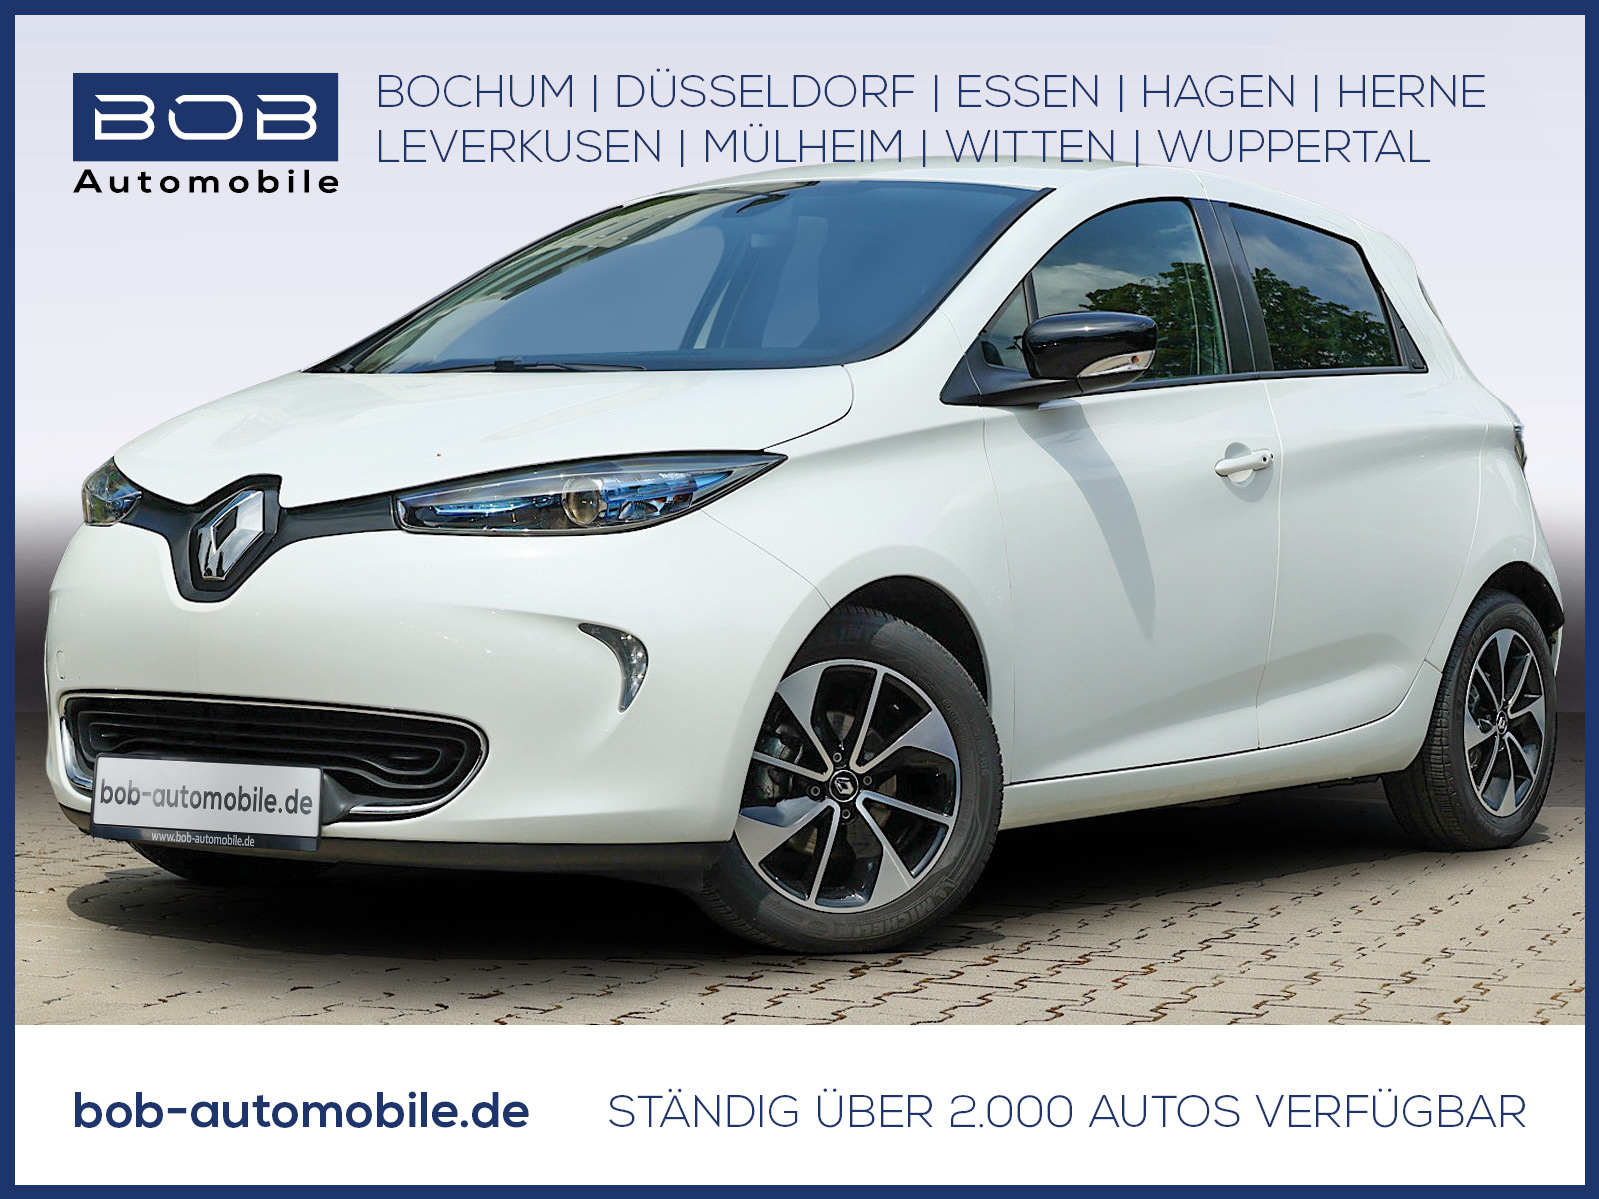 Renault ZOE Zoe NAVI PDC KLIMA LM-Felgen BT ZV SERVO AUX, Jahr 2017, Elektro